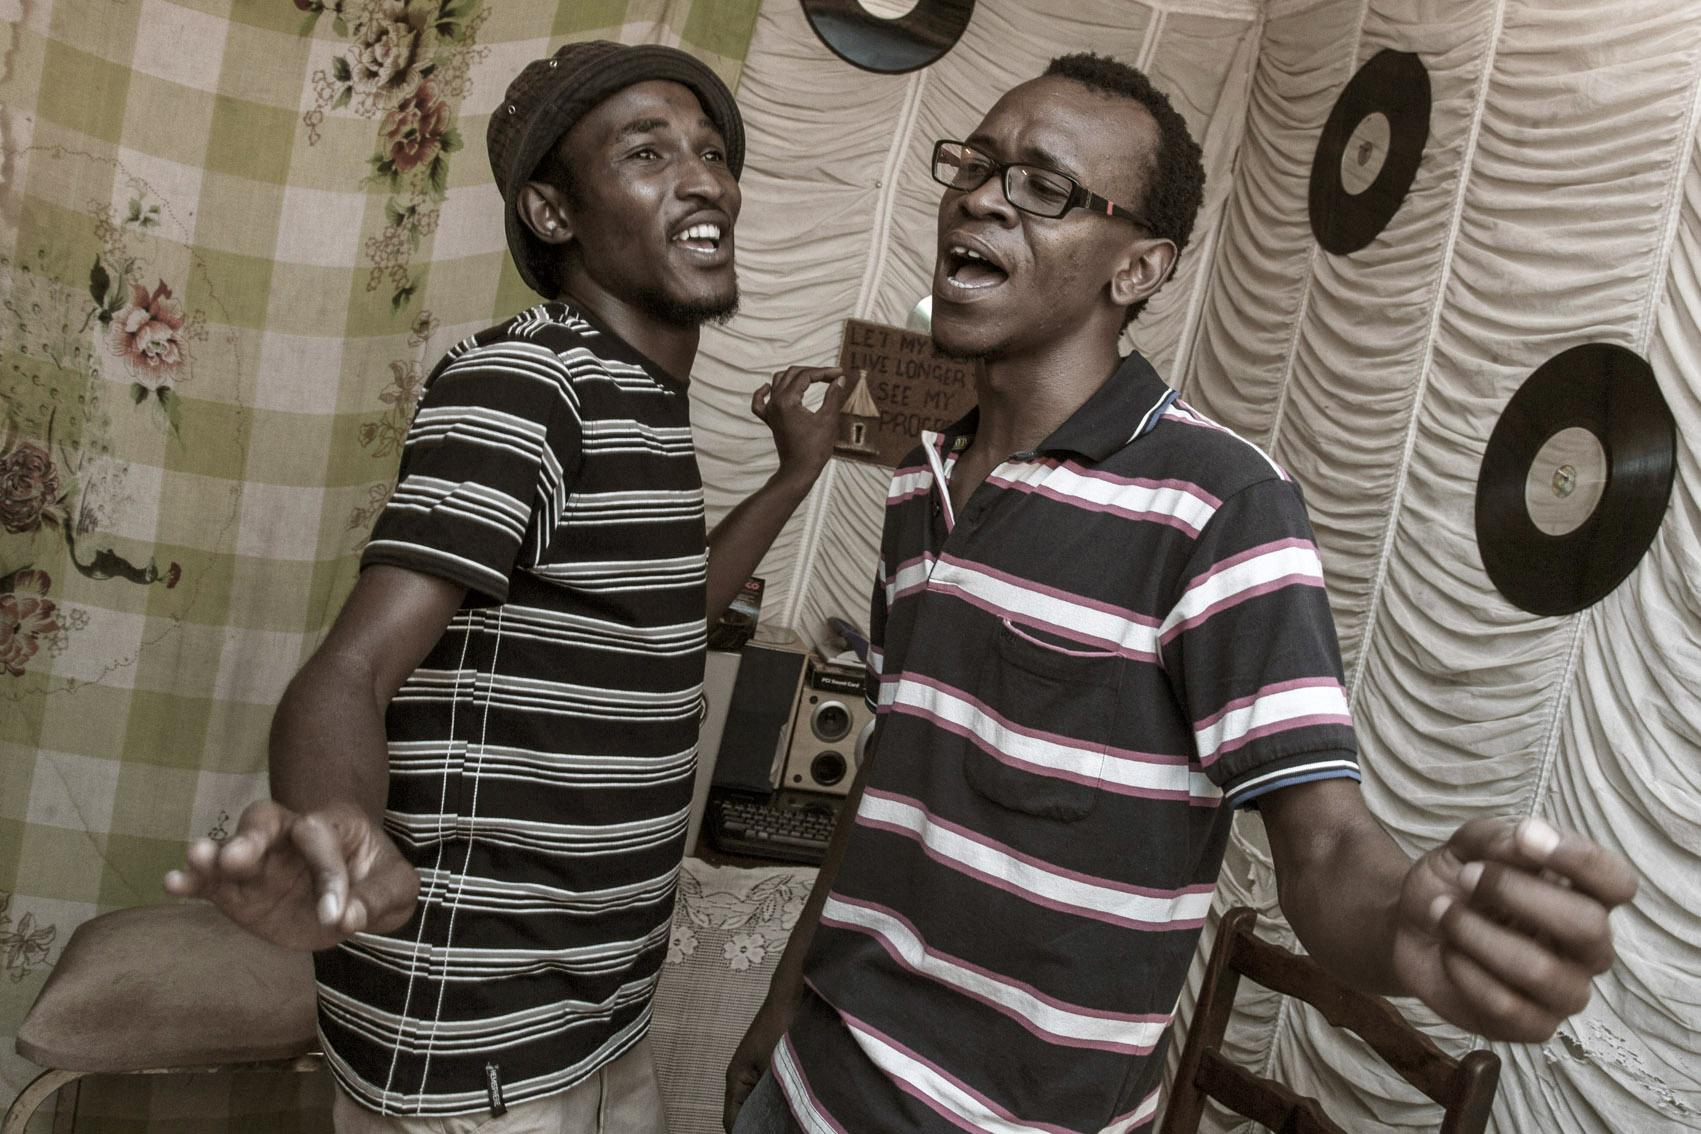 Karabo & Epic Article at their home studio, the Killjoy,  Rocklands (Bloemfontein)